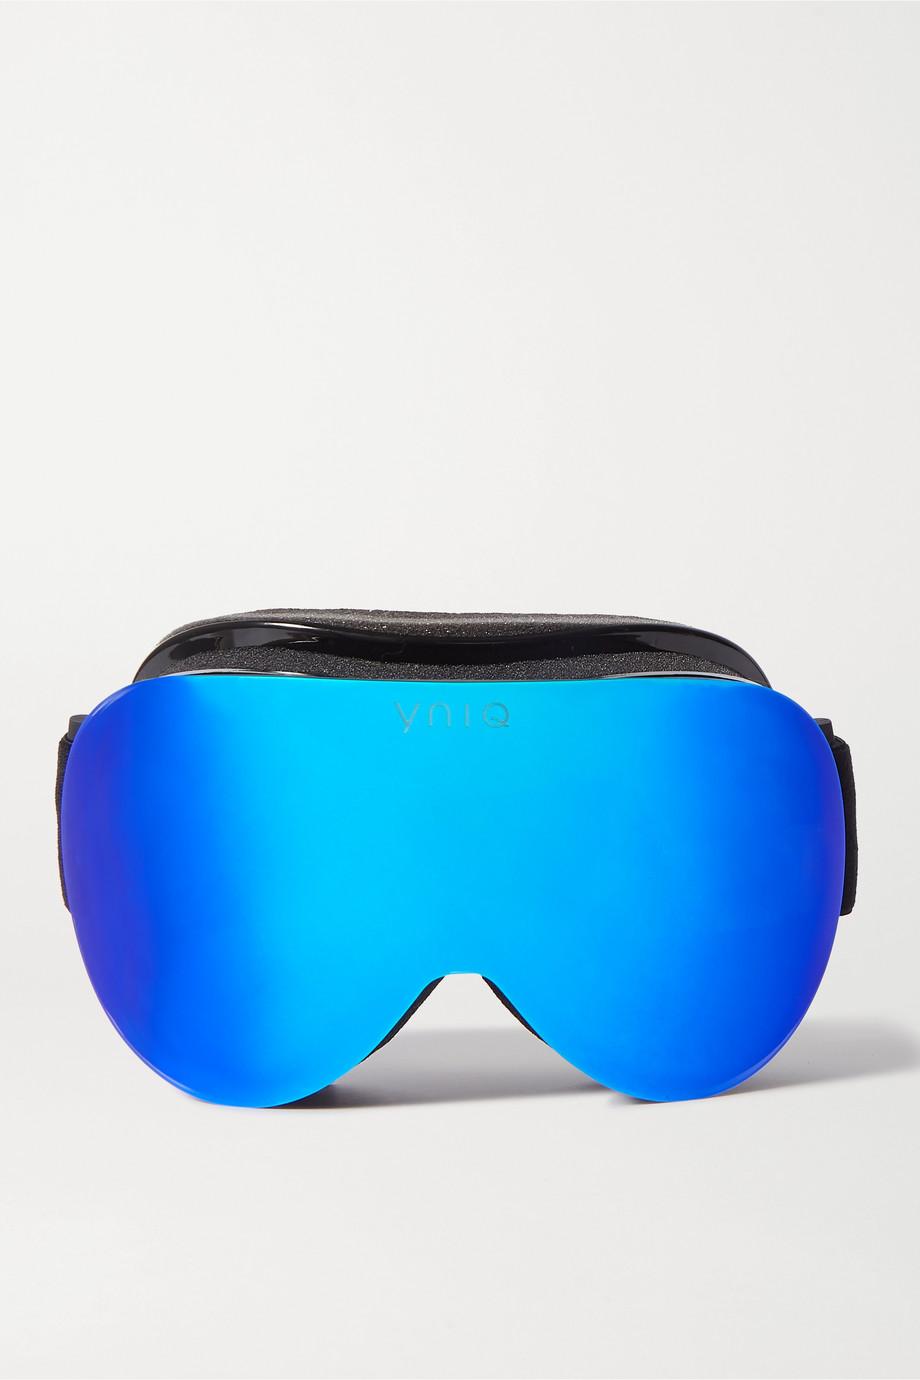 YNIQ Model Two mirrored ski googles